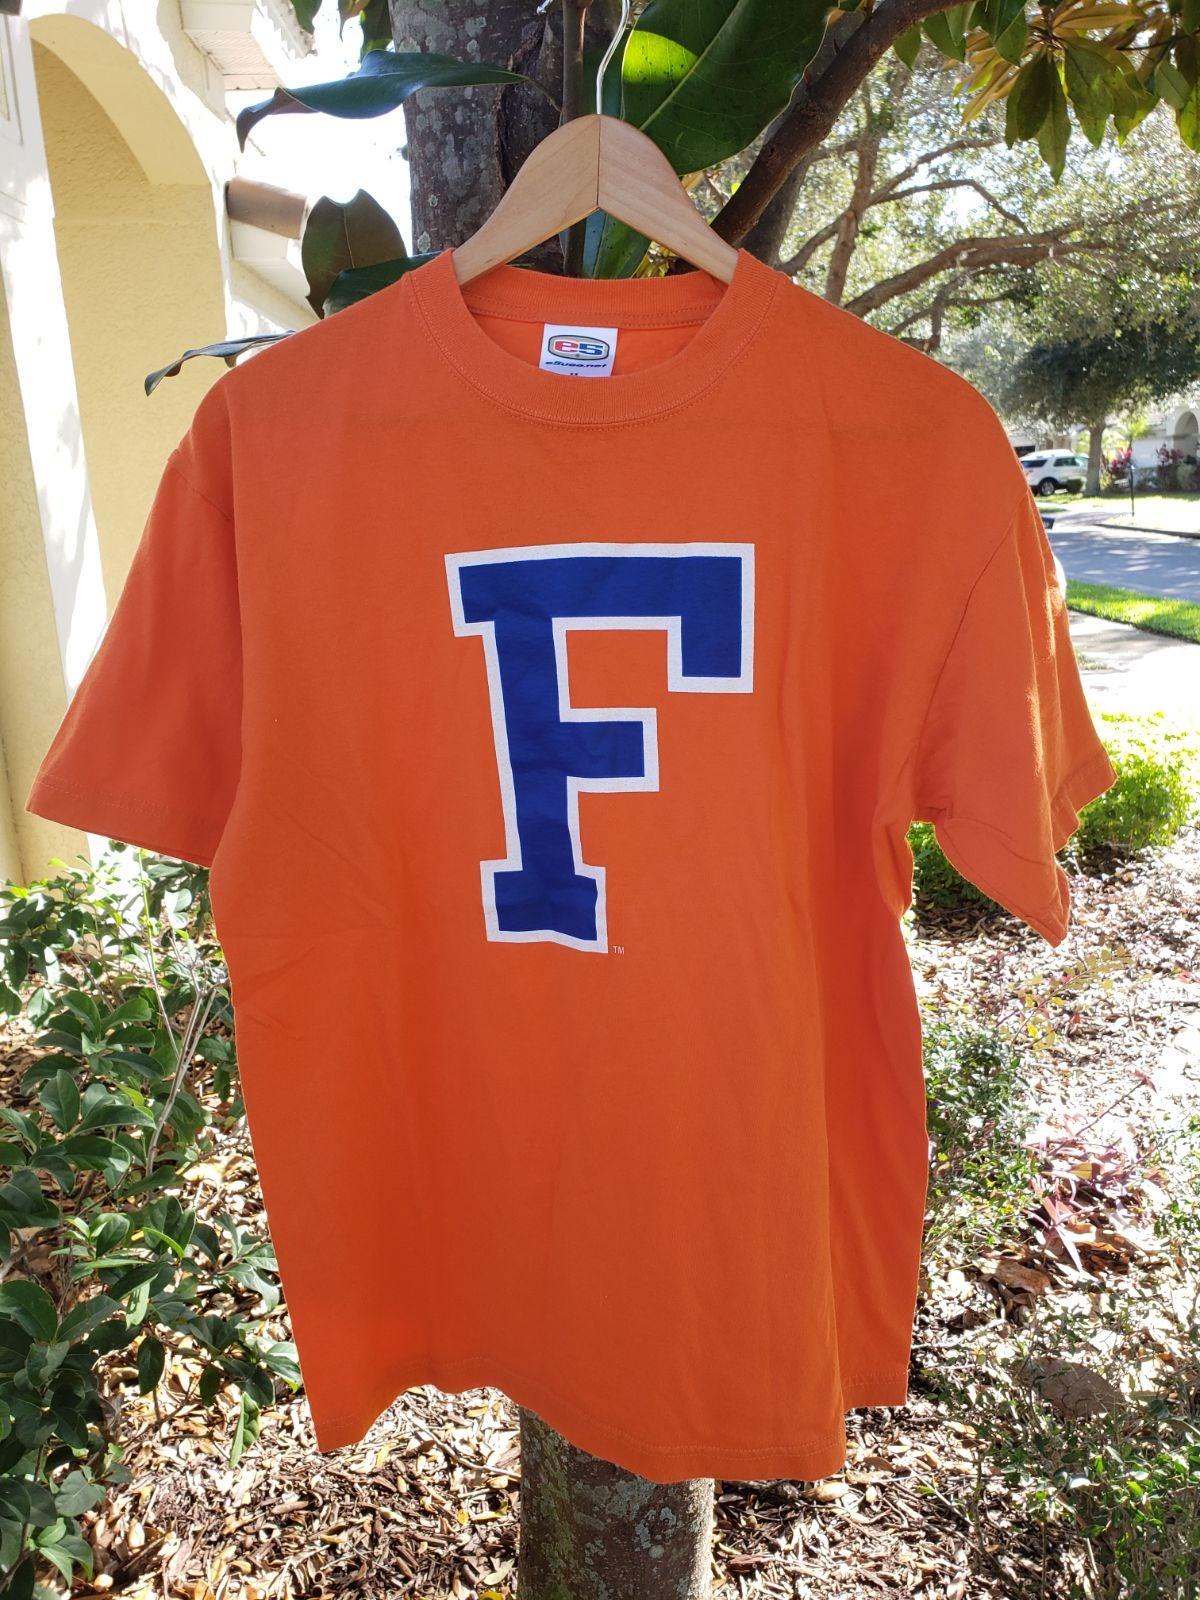 UF t shirt